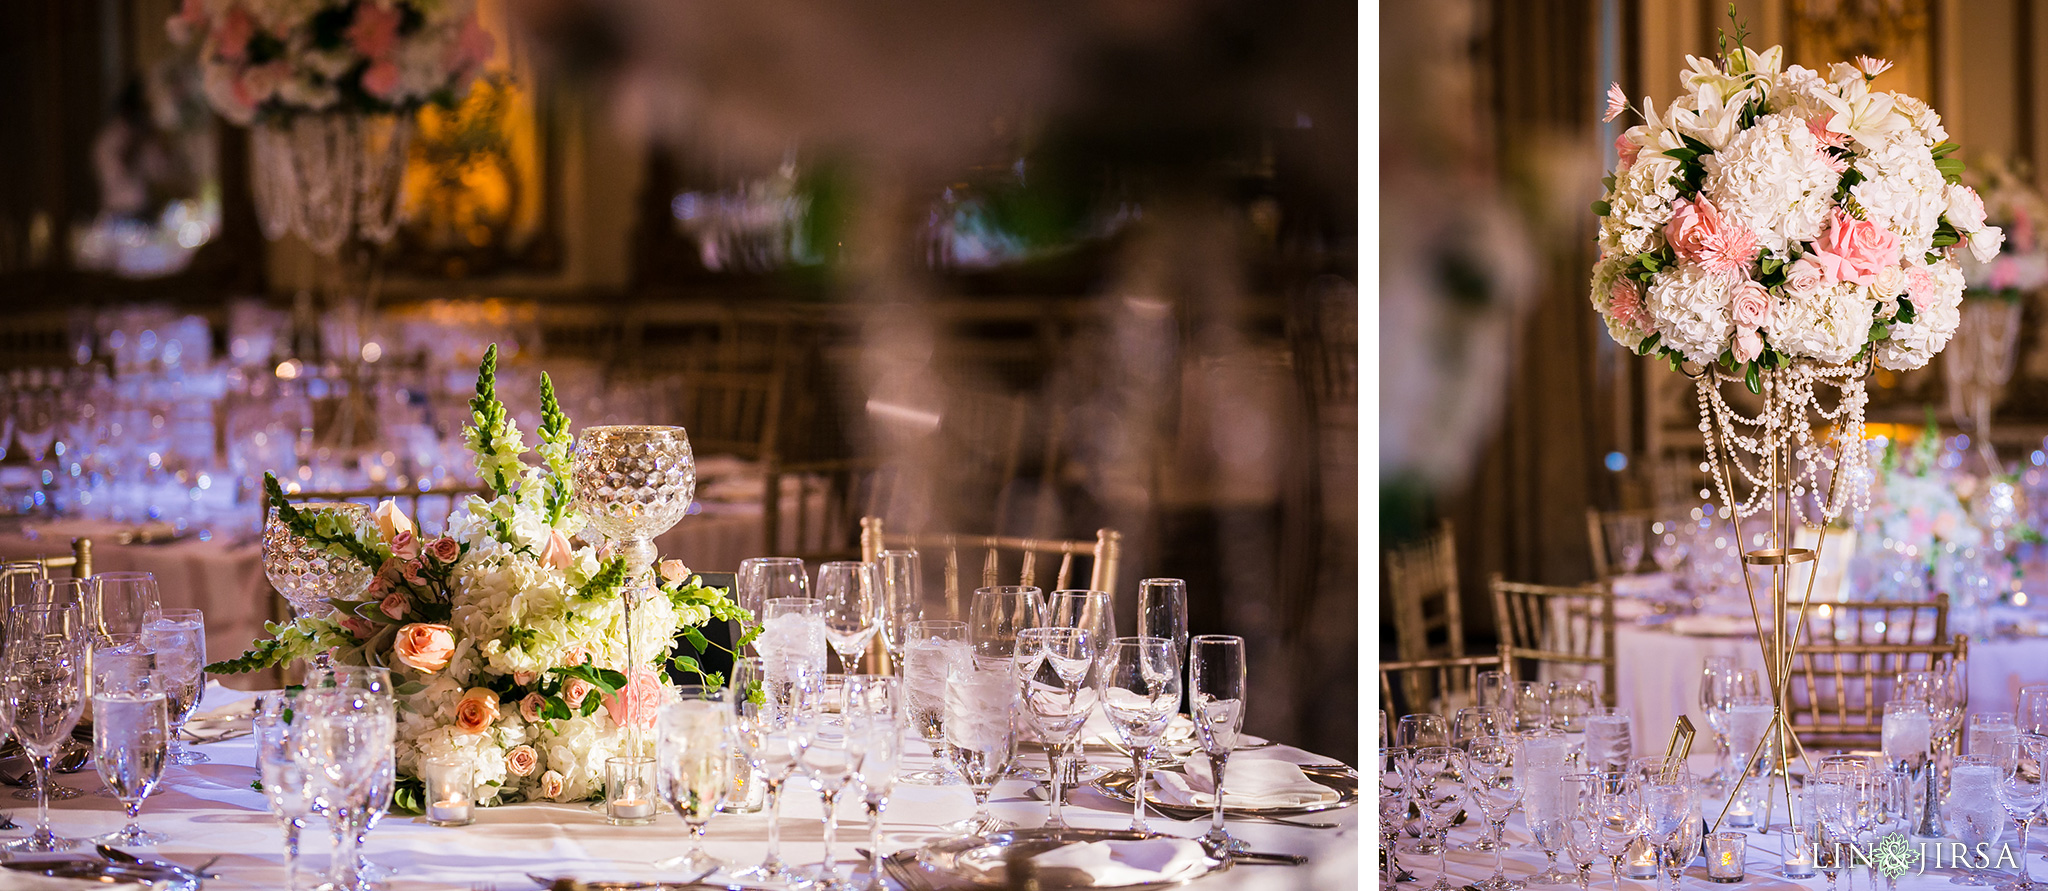 40 fairmont san francisco indian fusion wedding photography for San francisco wedding photography